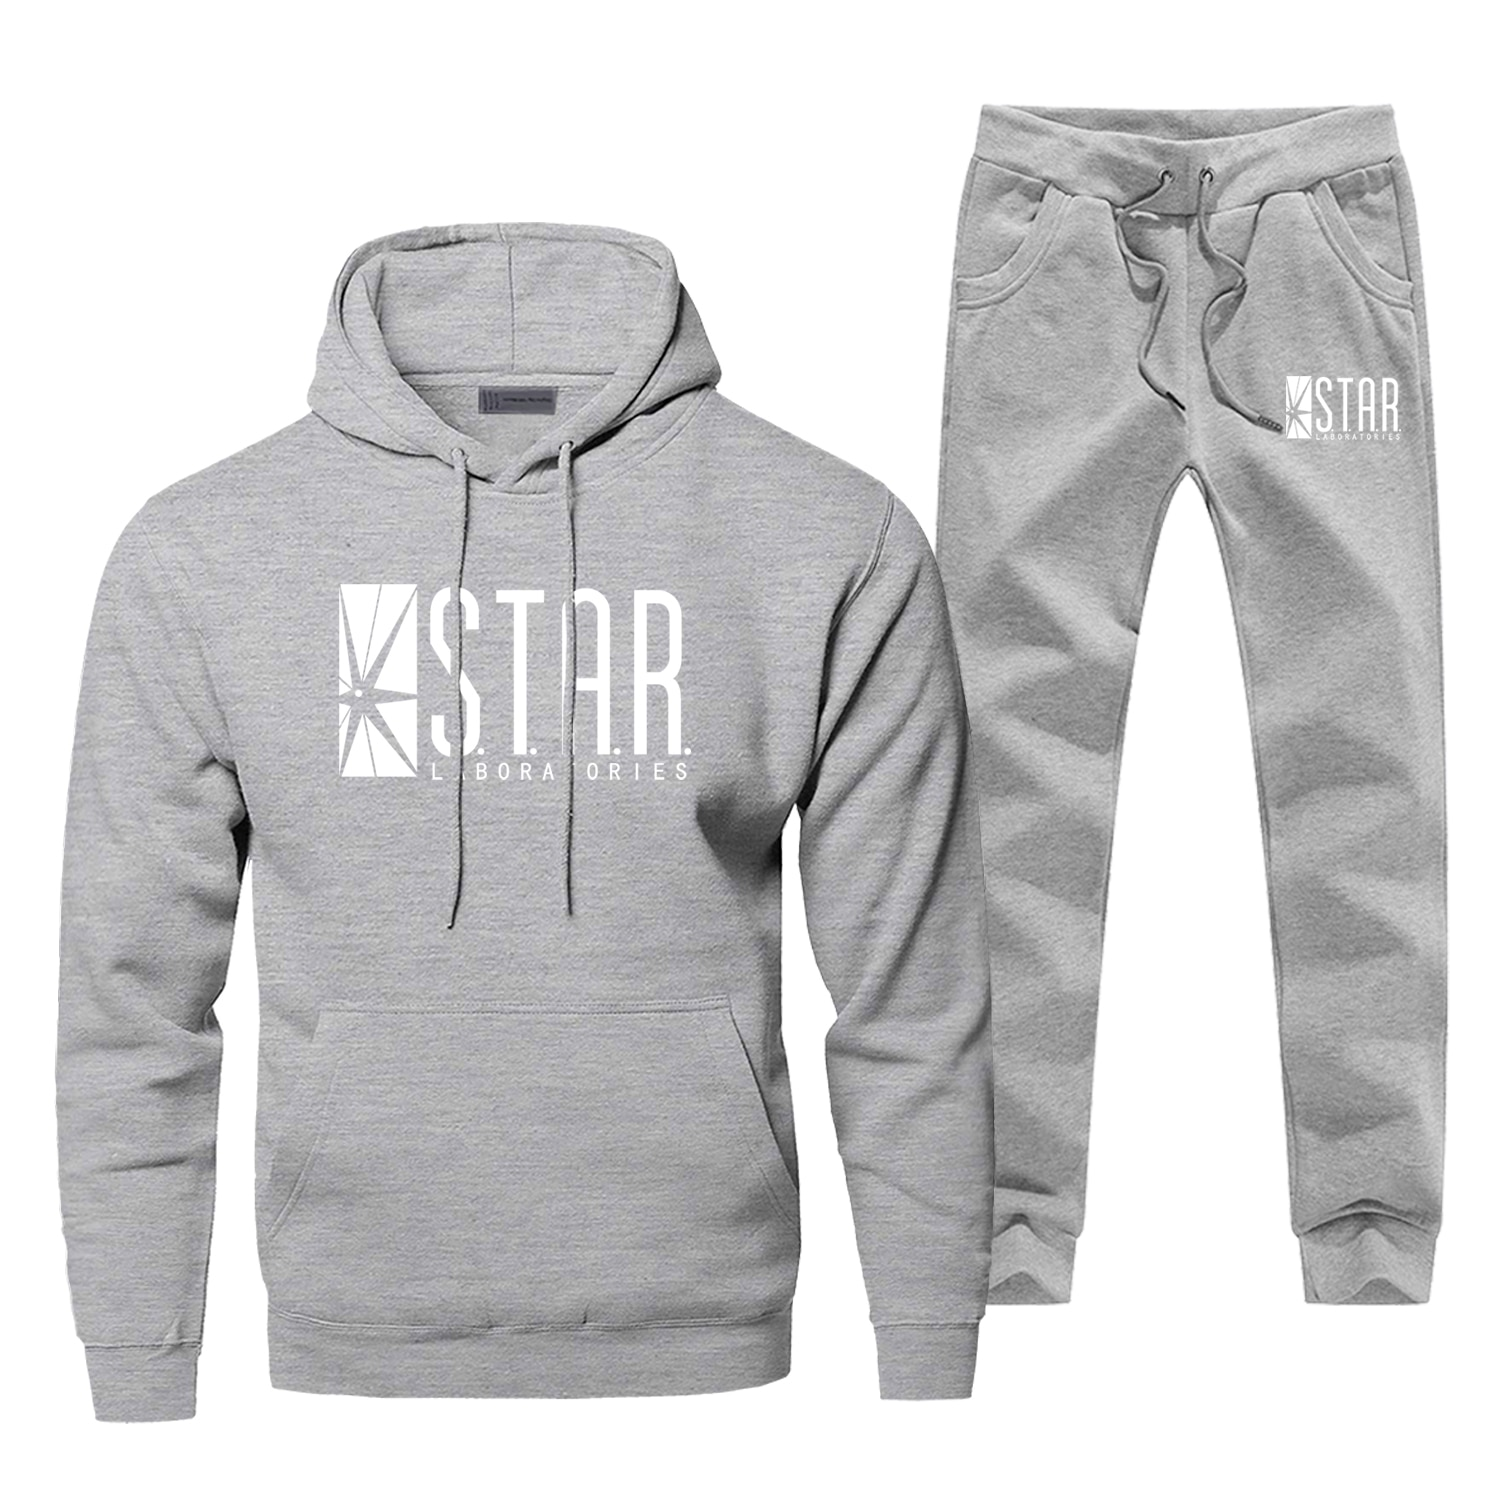 S.T.A.R Star Labs ropa para hombres Flash Cosplay traje completo de chándal de moda TV Show Fitness pantalones de chándal Bodywarmer Conjunto masculino